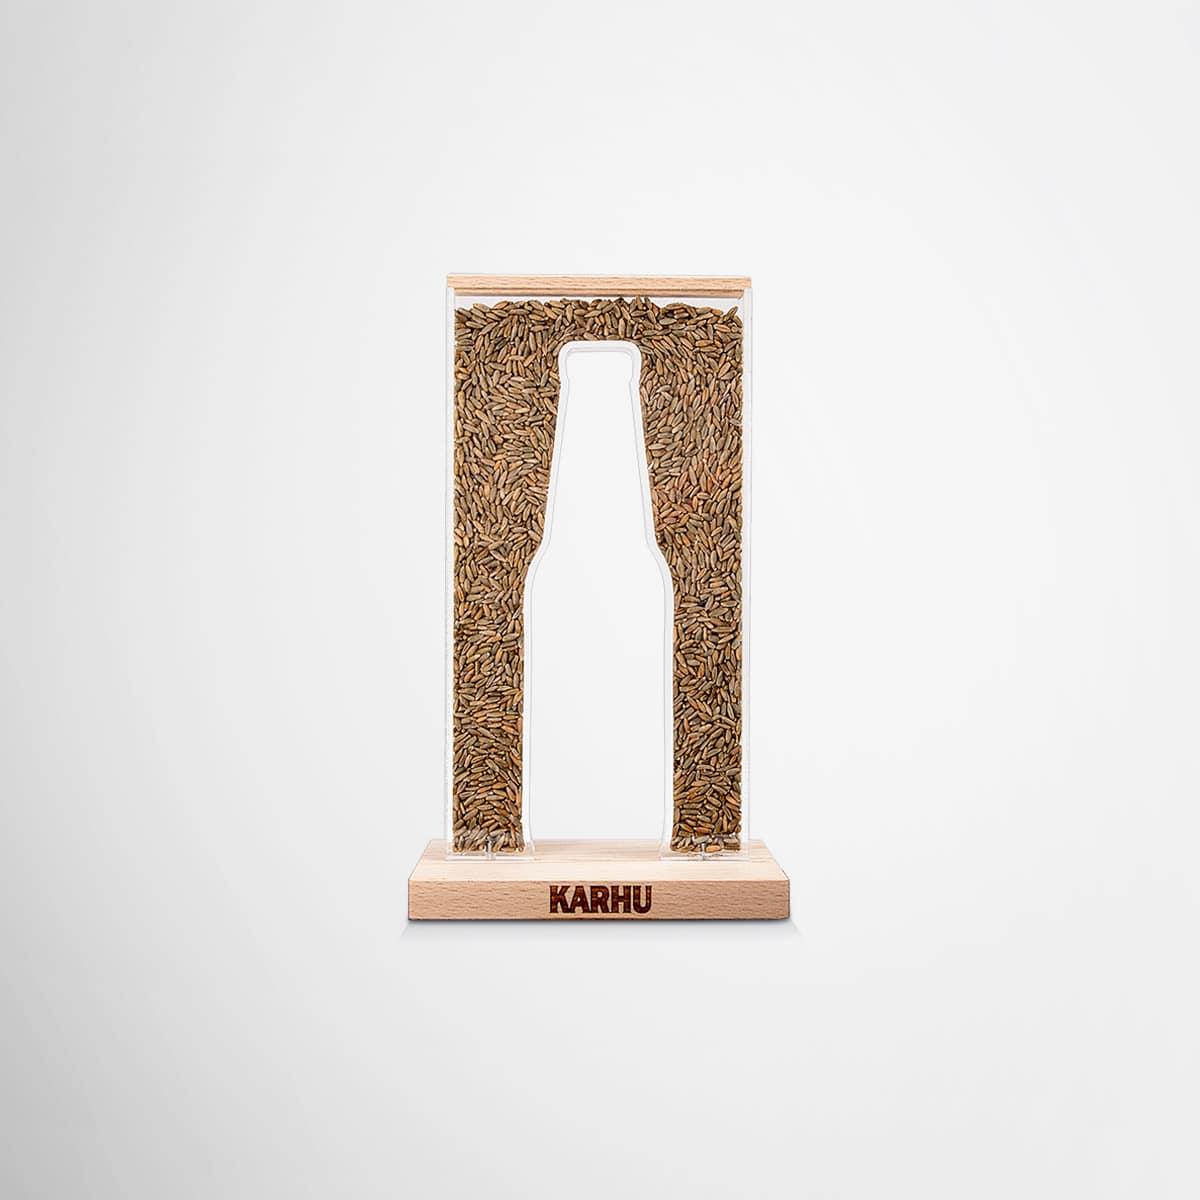 Karhu olut glorifier by Framme